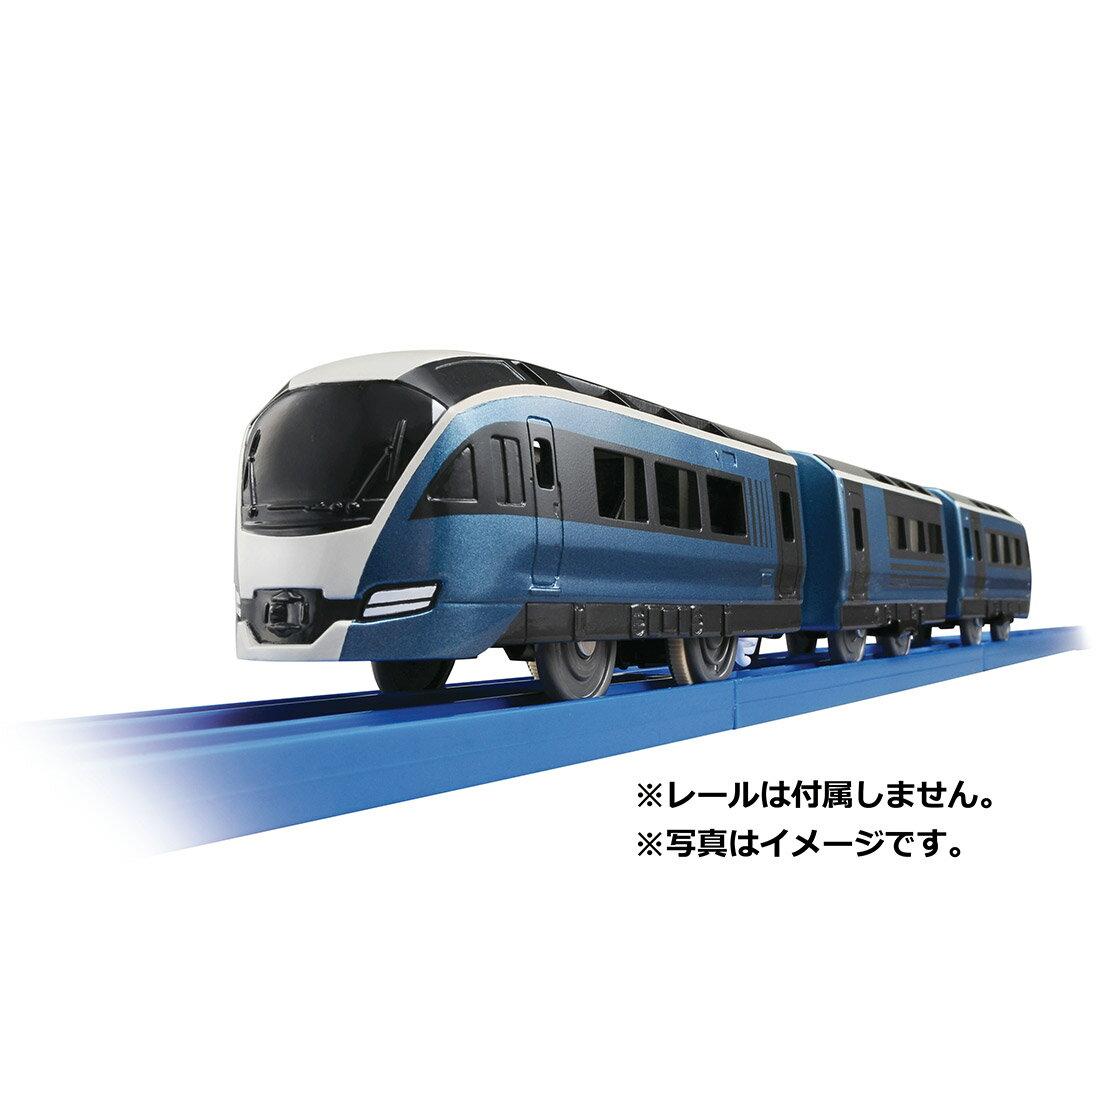 《TAKARA TOMY》 PLARAIL鐵道王國 S-37藍寶石踴子號 觀光列車 東喬精品百貨